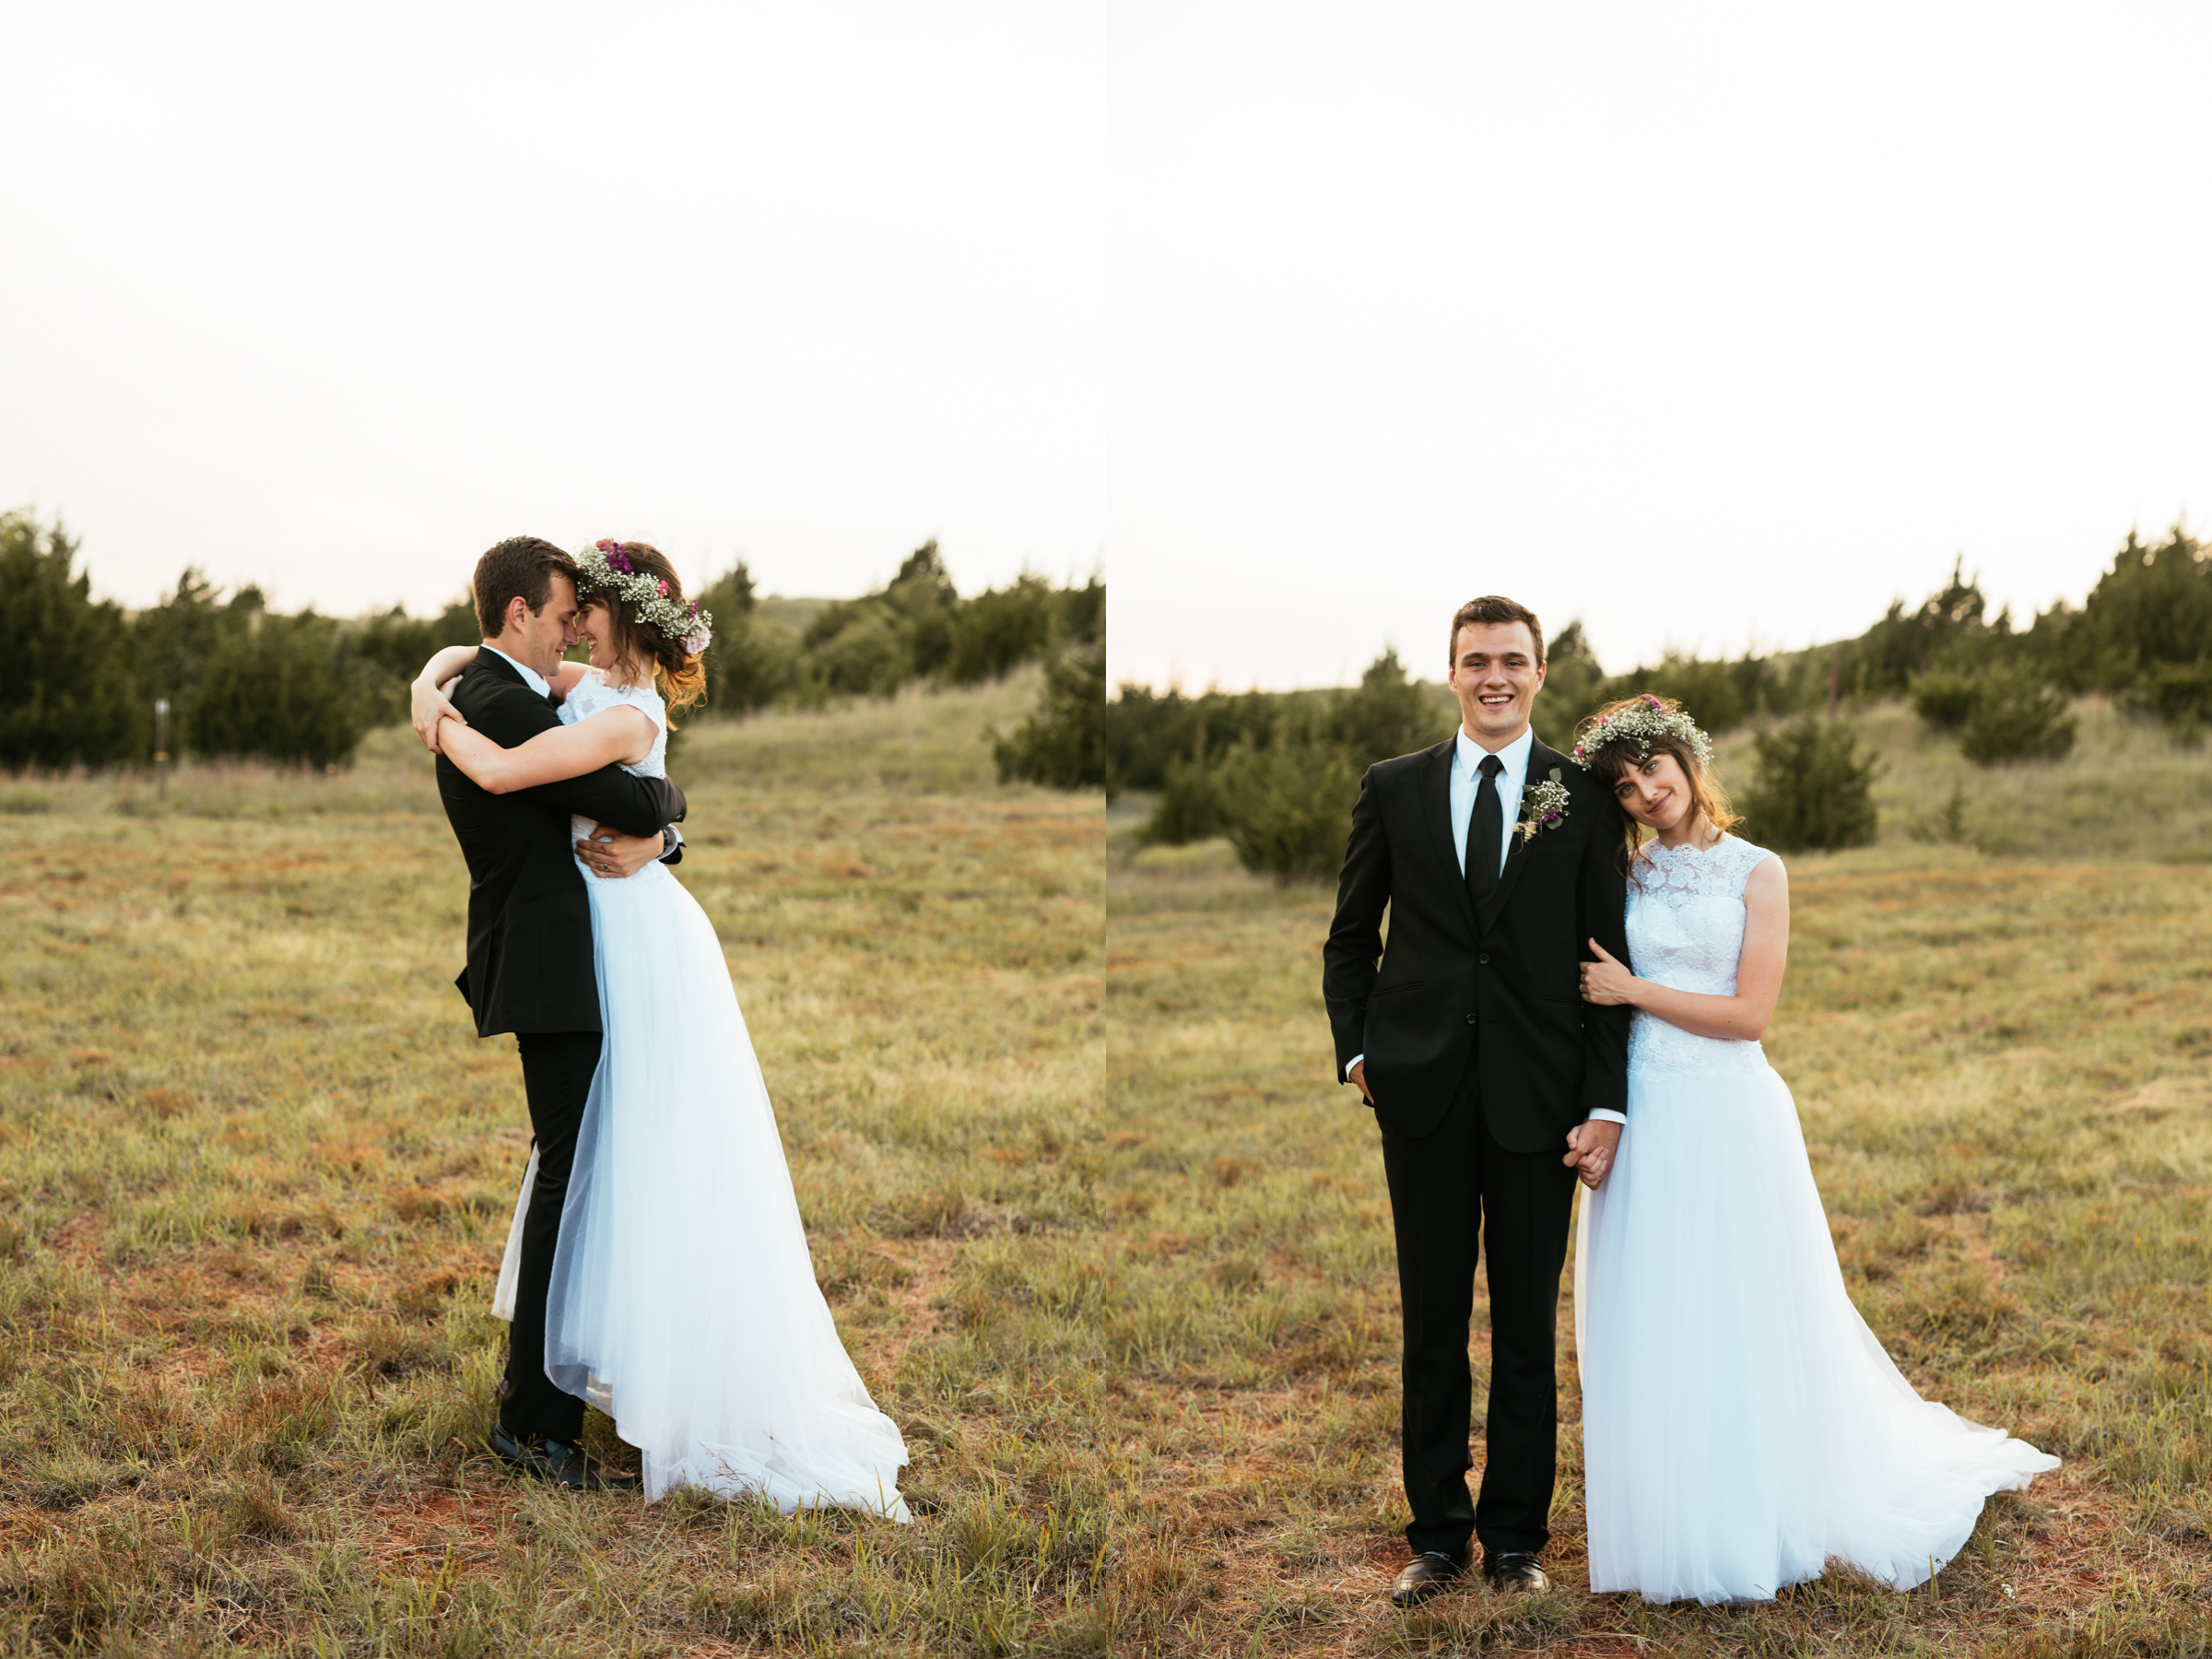 McCurrach Wedding12.jpg